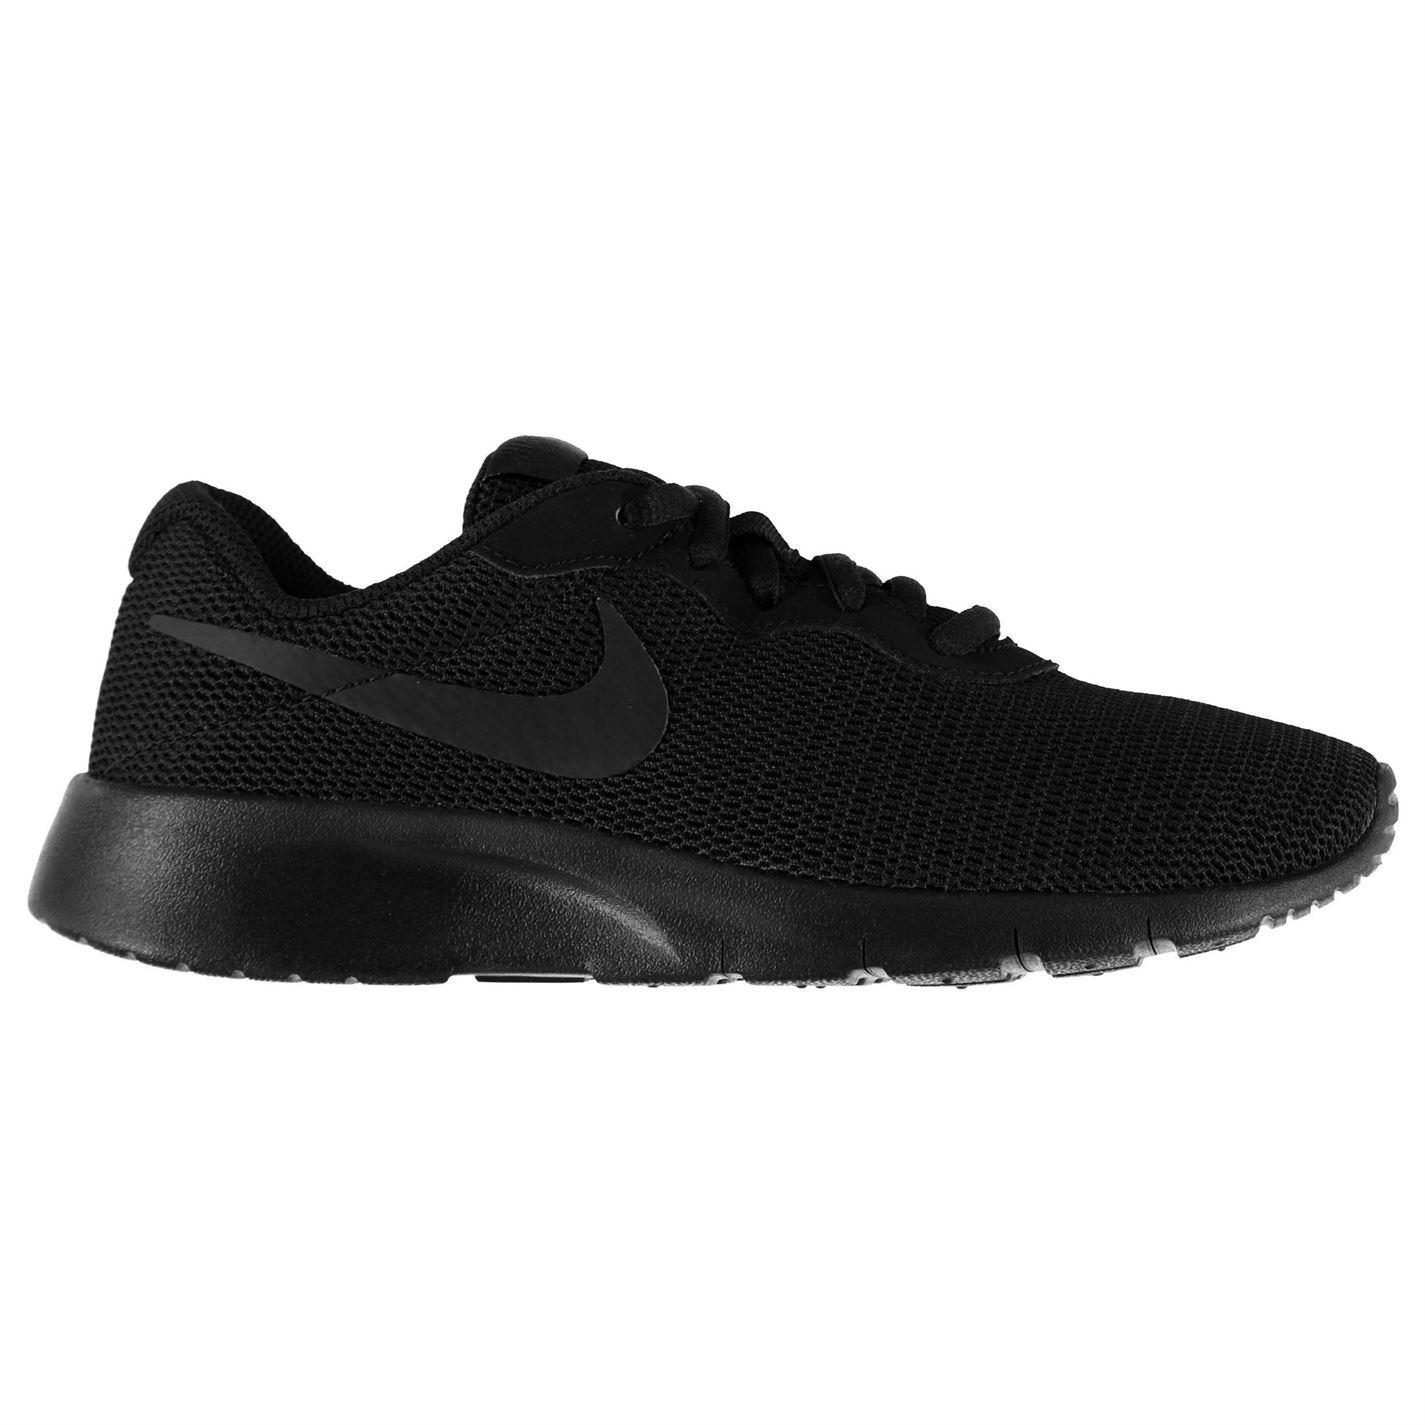 Details about Nike Tanjun Junior Boys Trainers Black Shoes Footwear